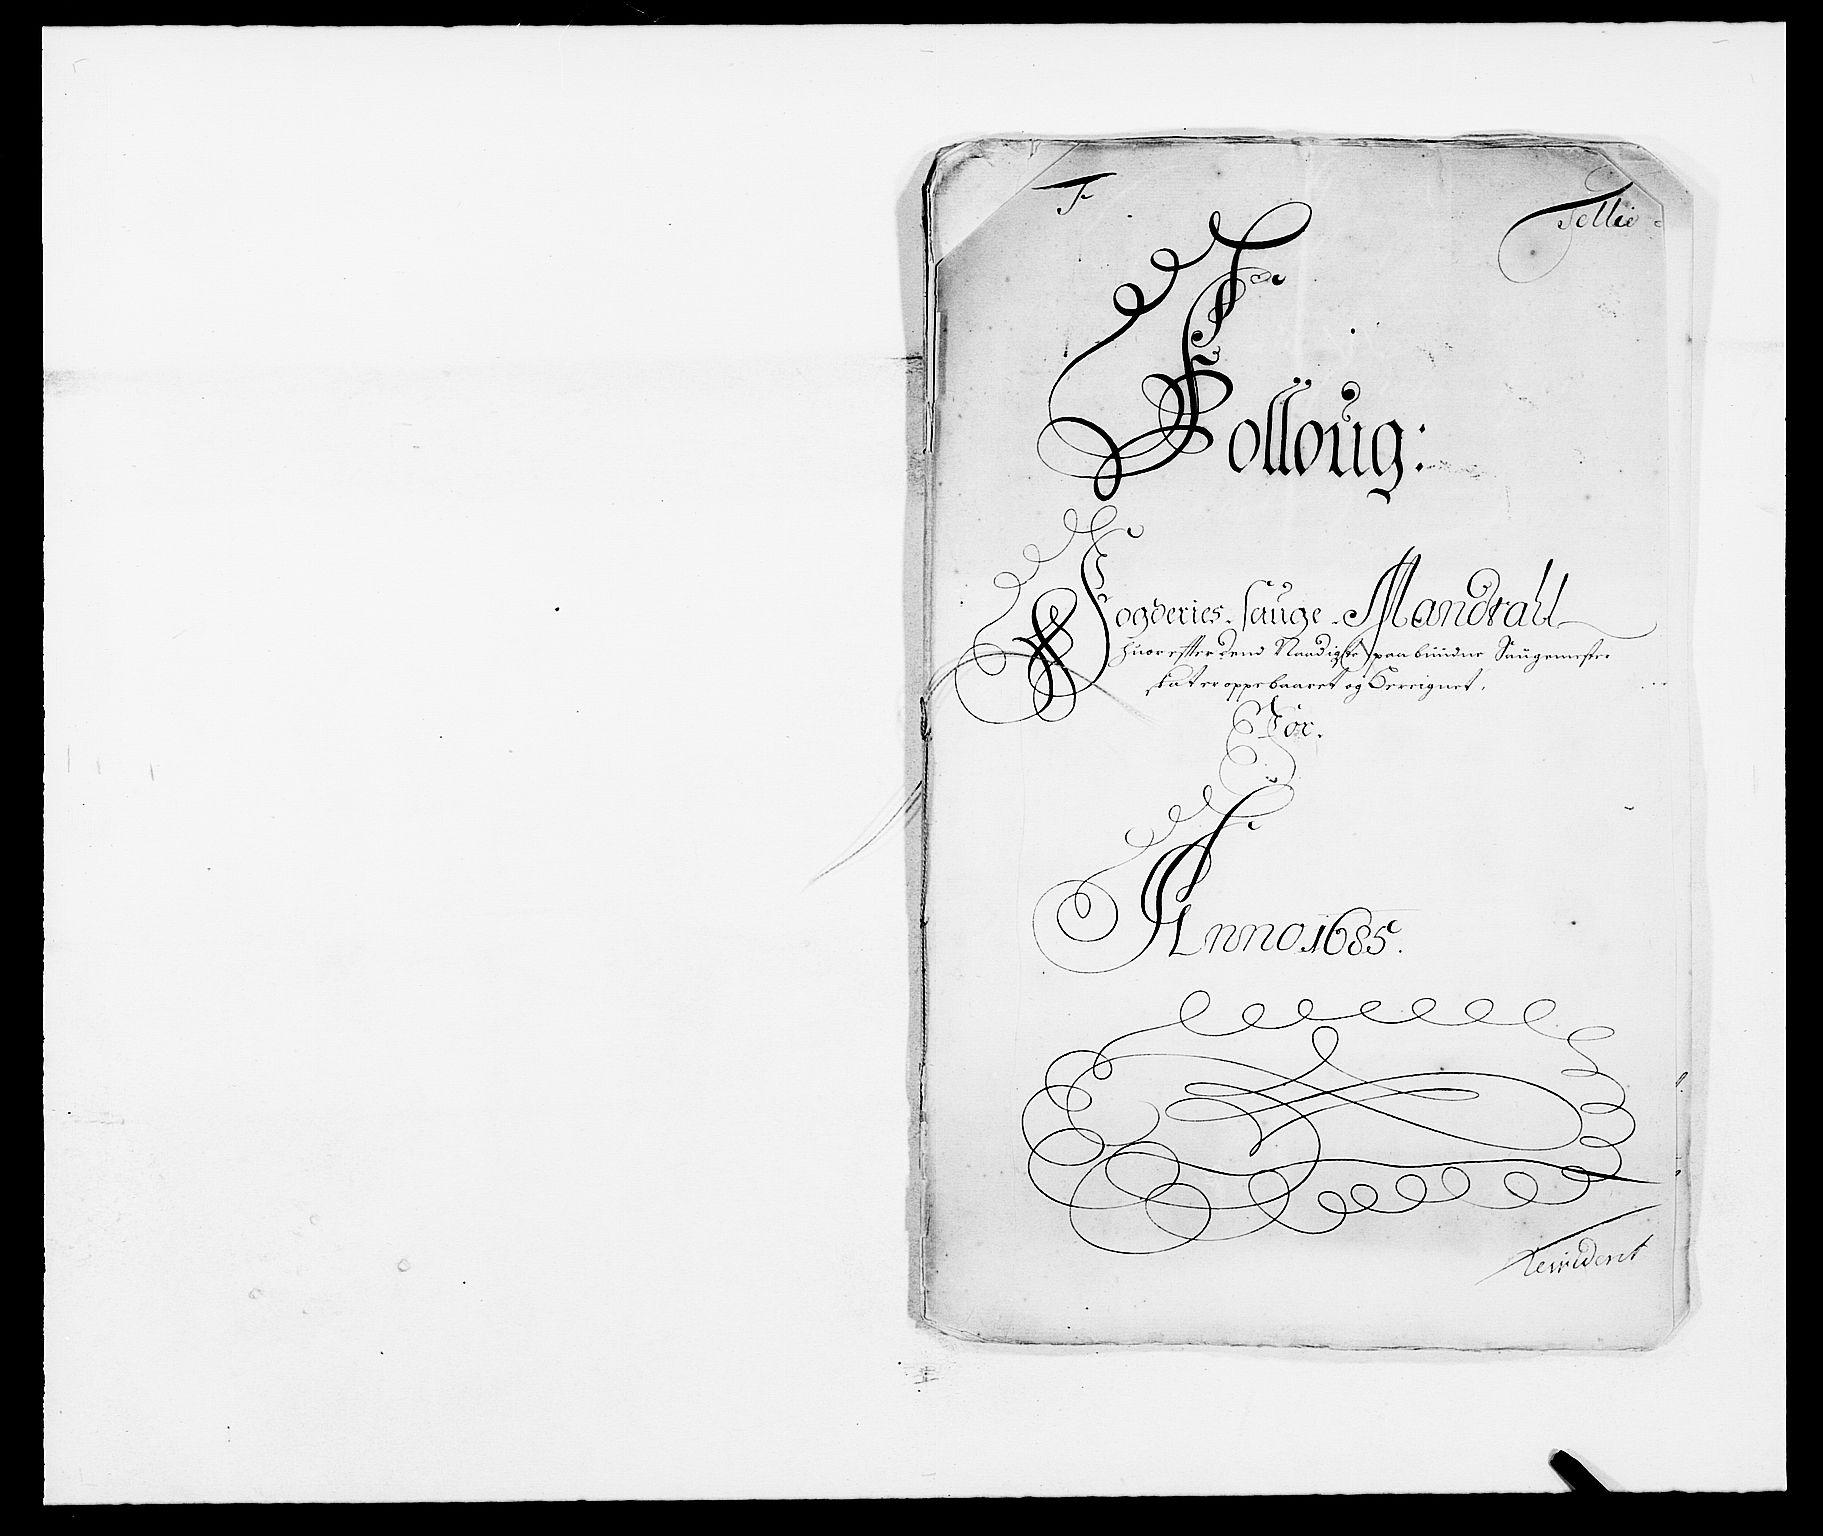 RA, Rentekammeret inntil 1814, Reviderte regnskaper, Fogderegnskap, R09/L0433: Fogderegnskap Follo, 1685-1686, s. 172